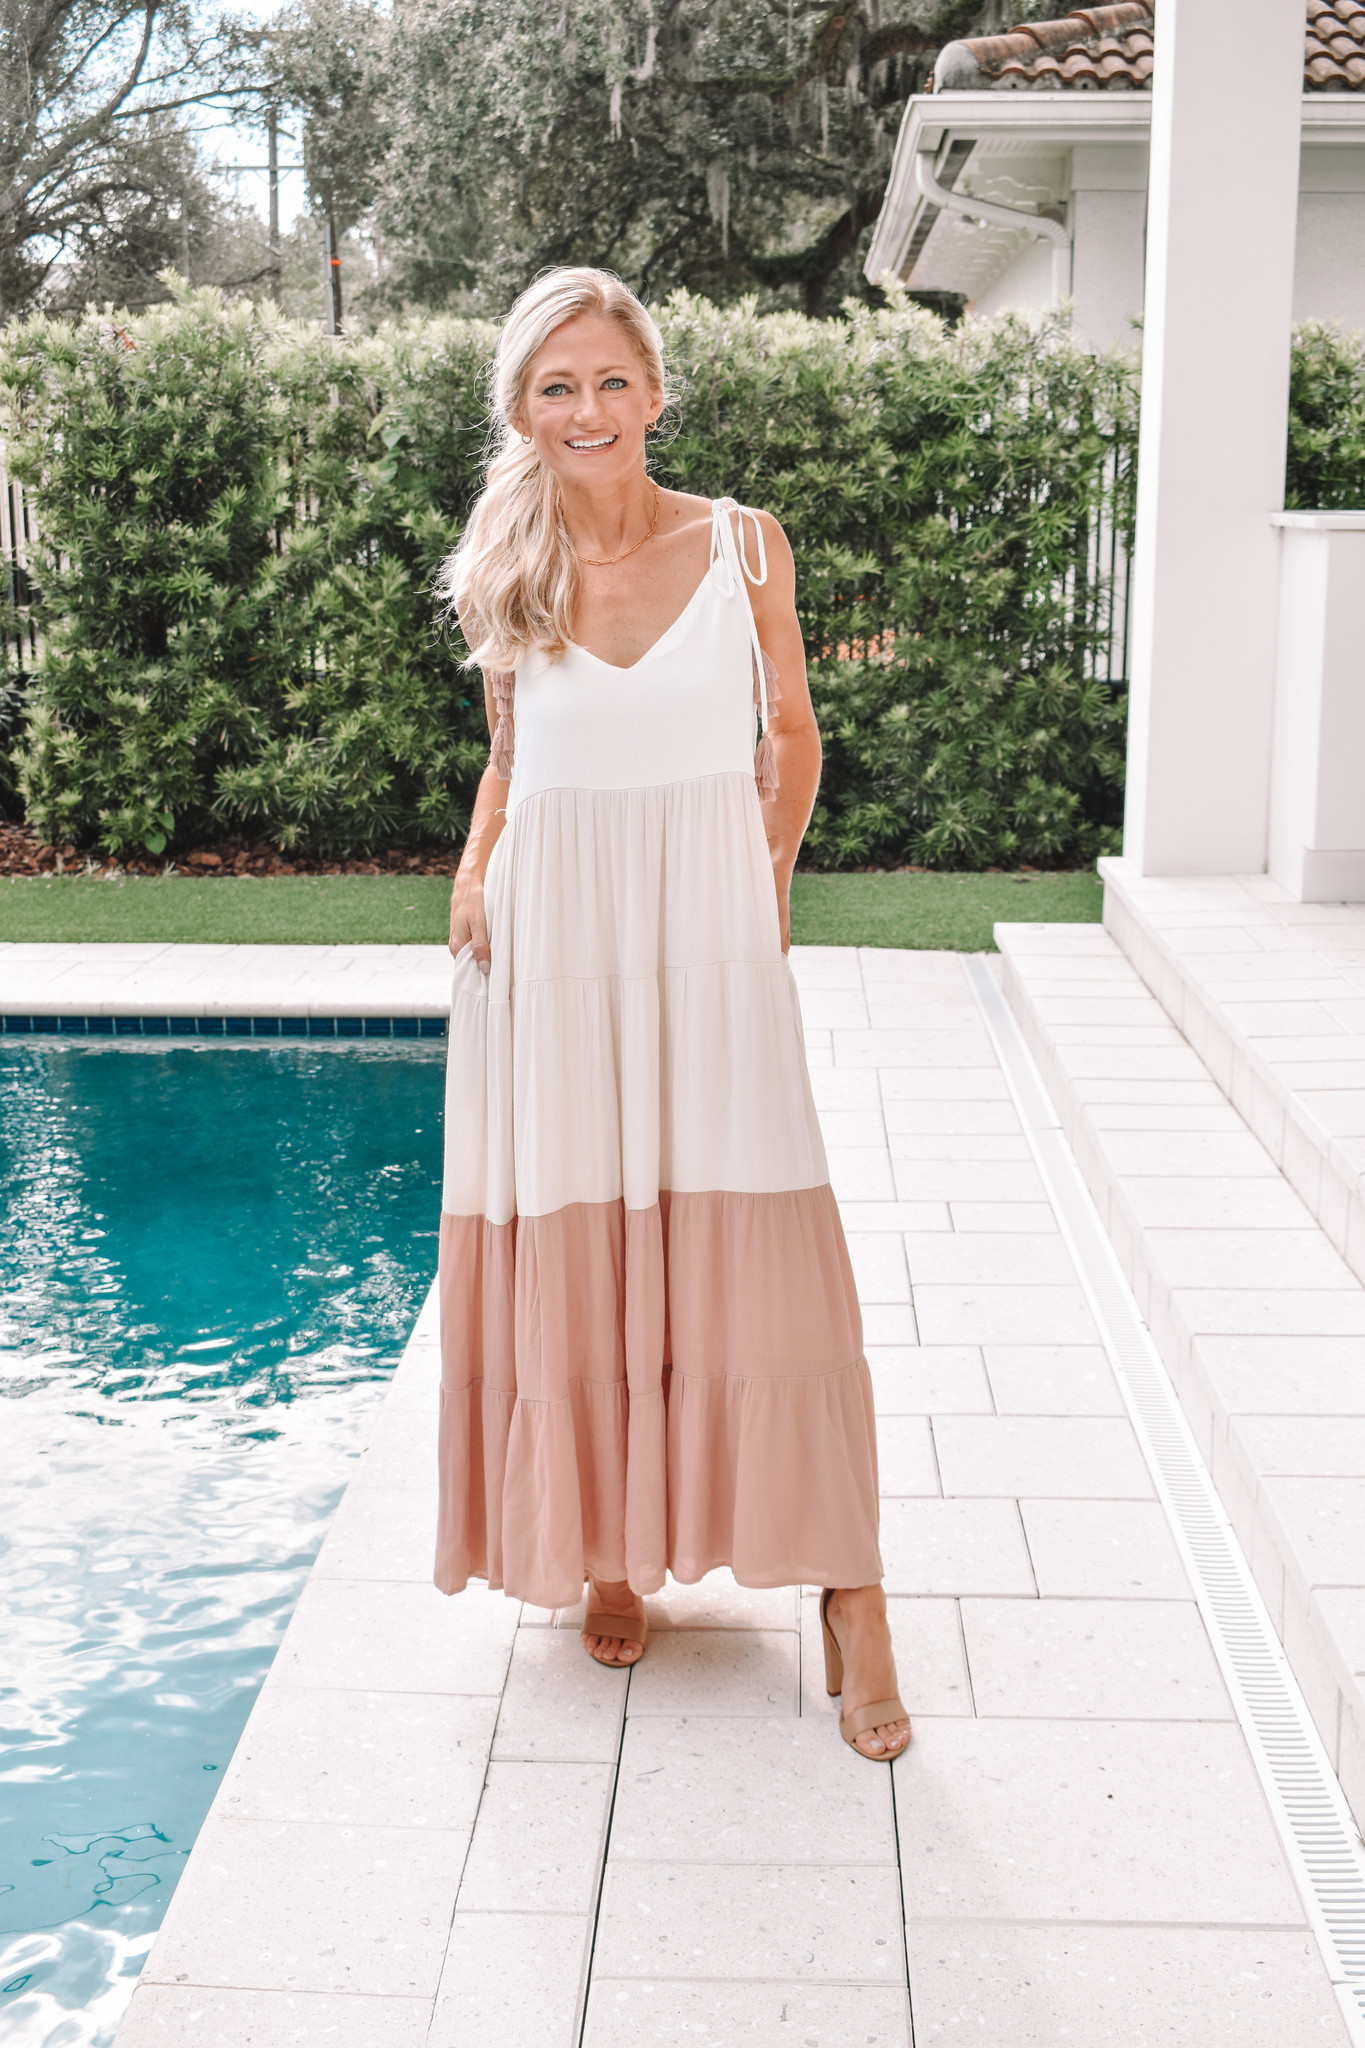 The Bianca Maxi Dress